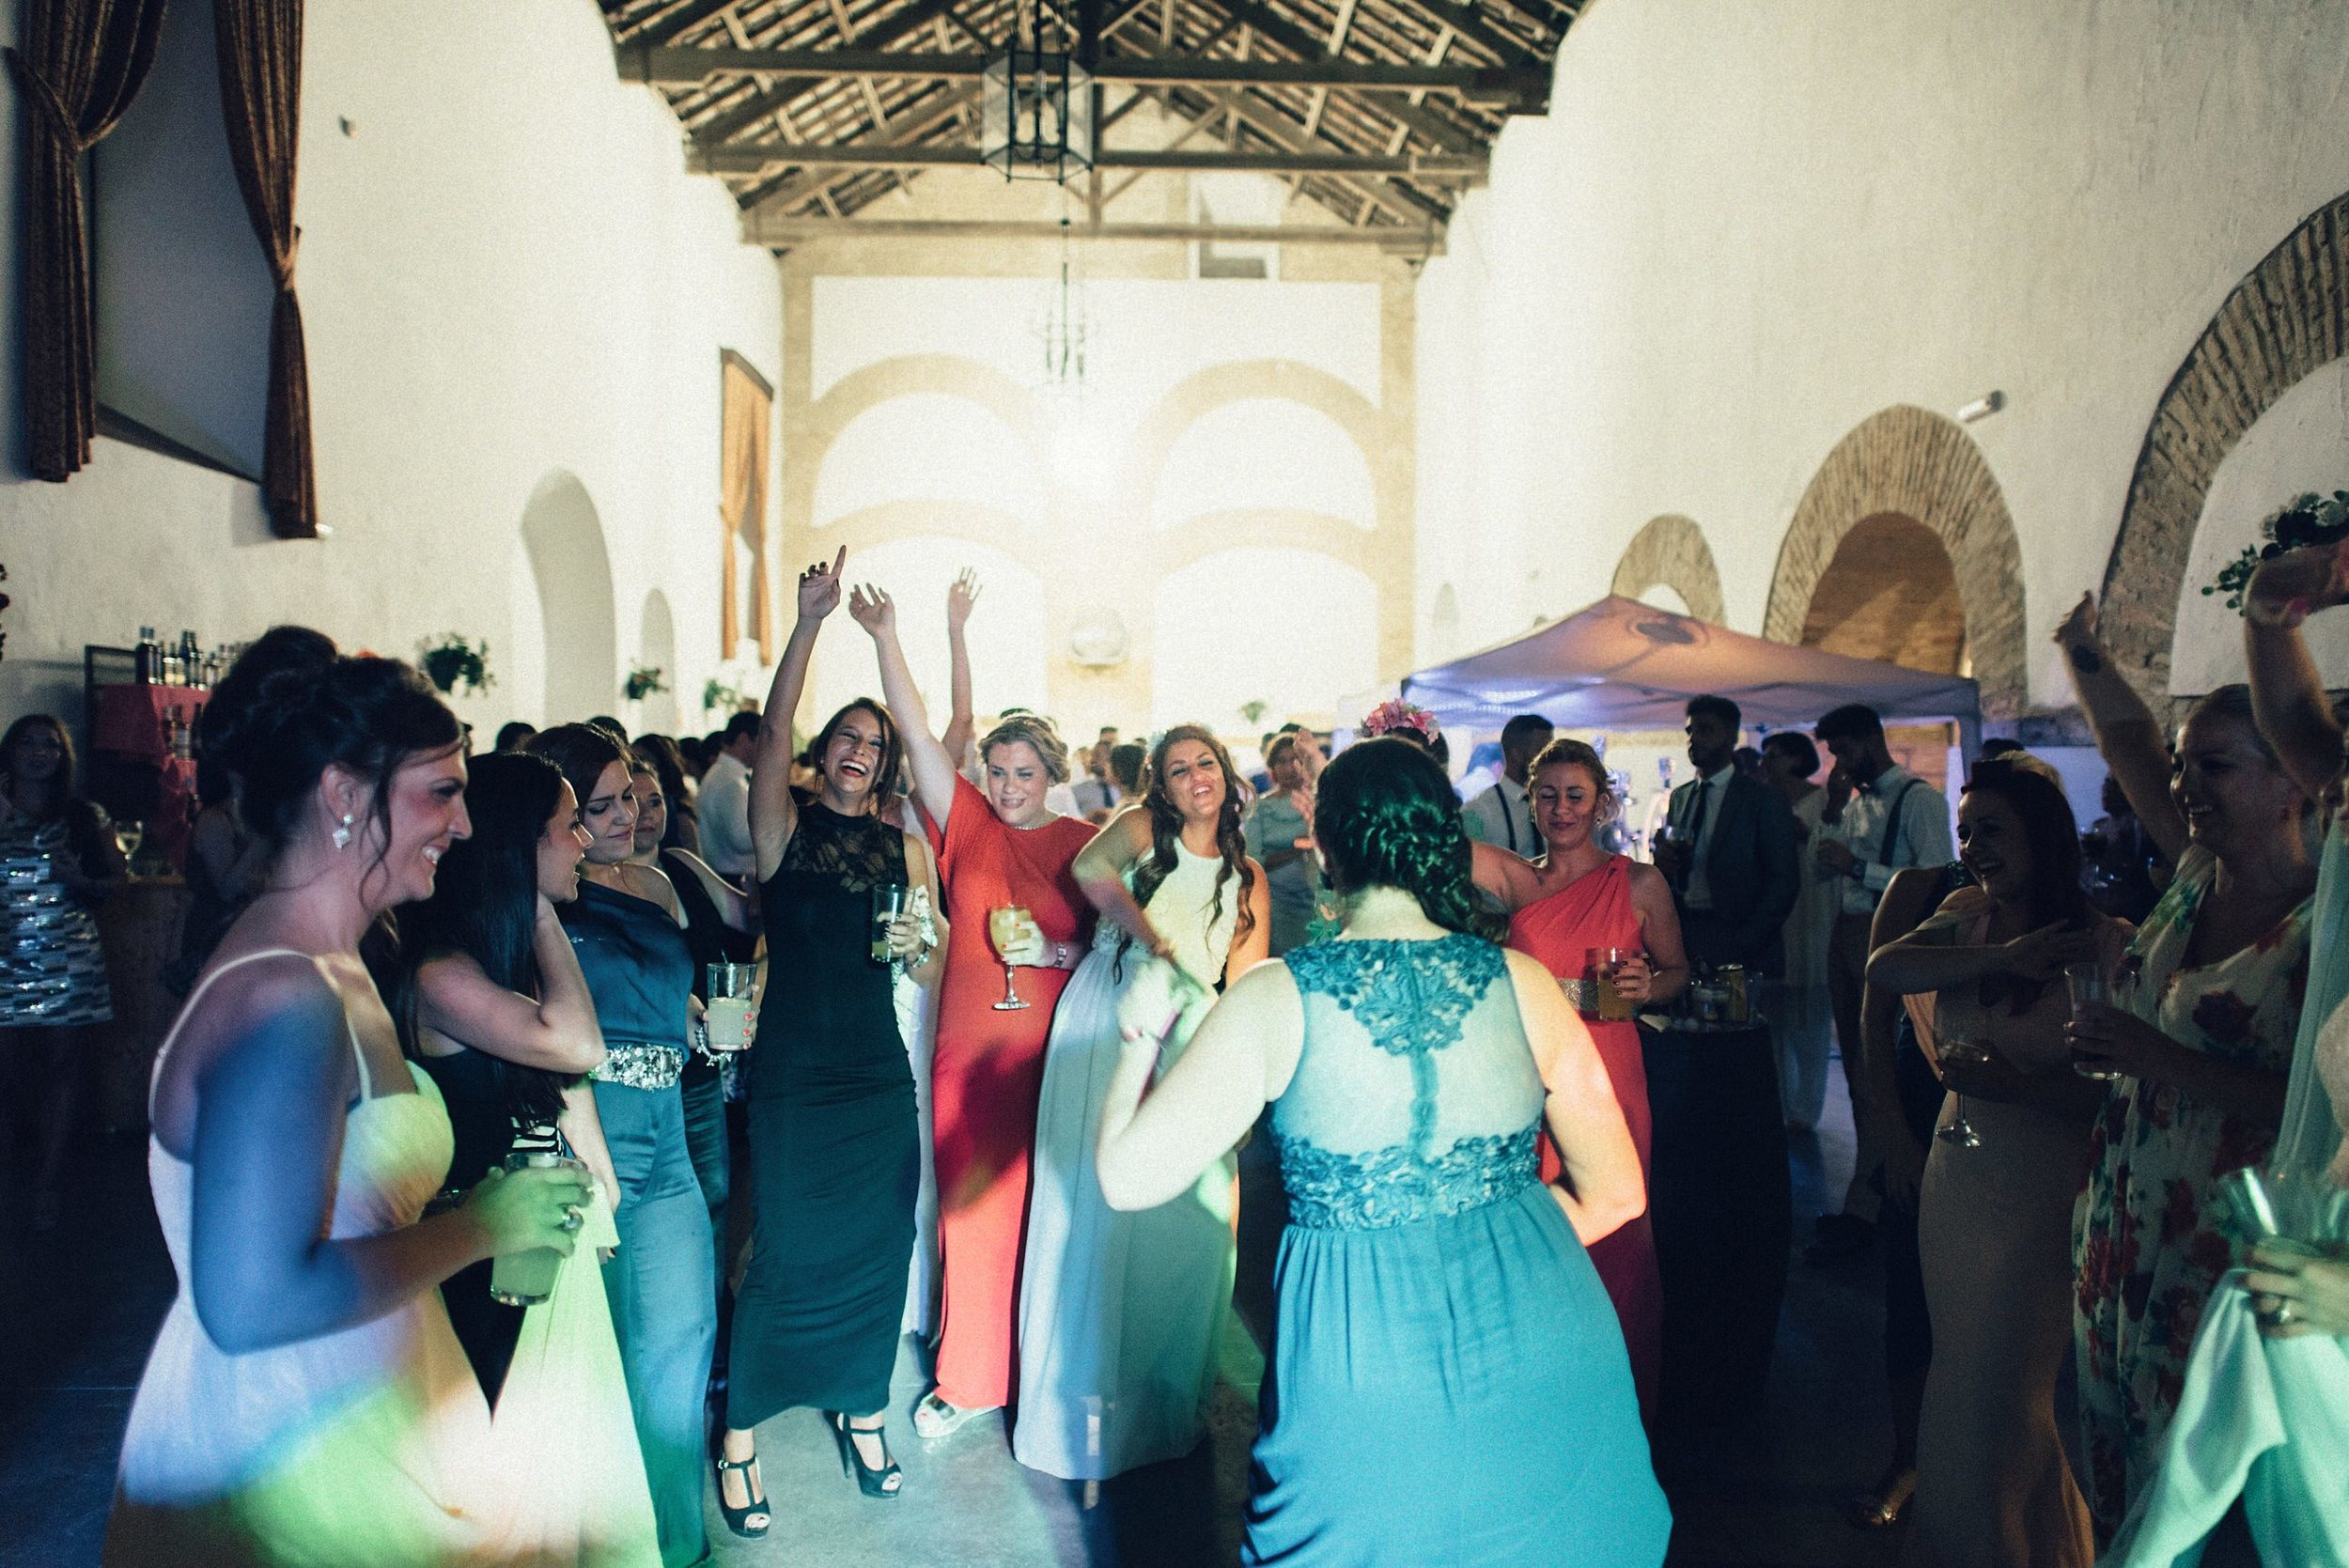 Boda en Utrera - Sevilla - Consolacion - Santuario - Alicia & Jesus DSC_5196exposure.jpg